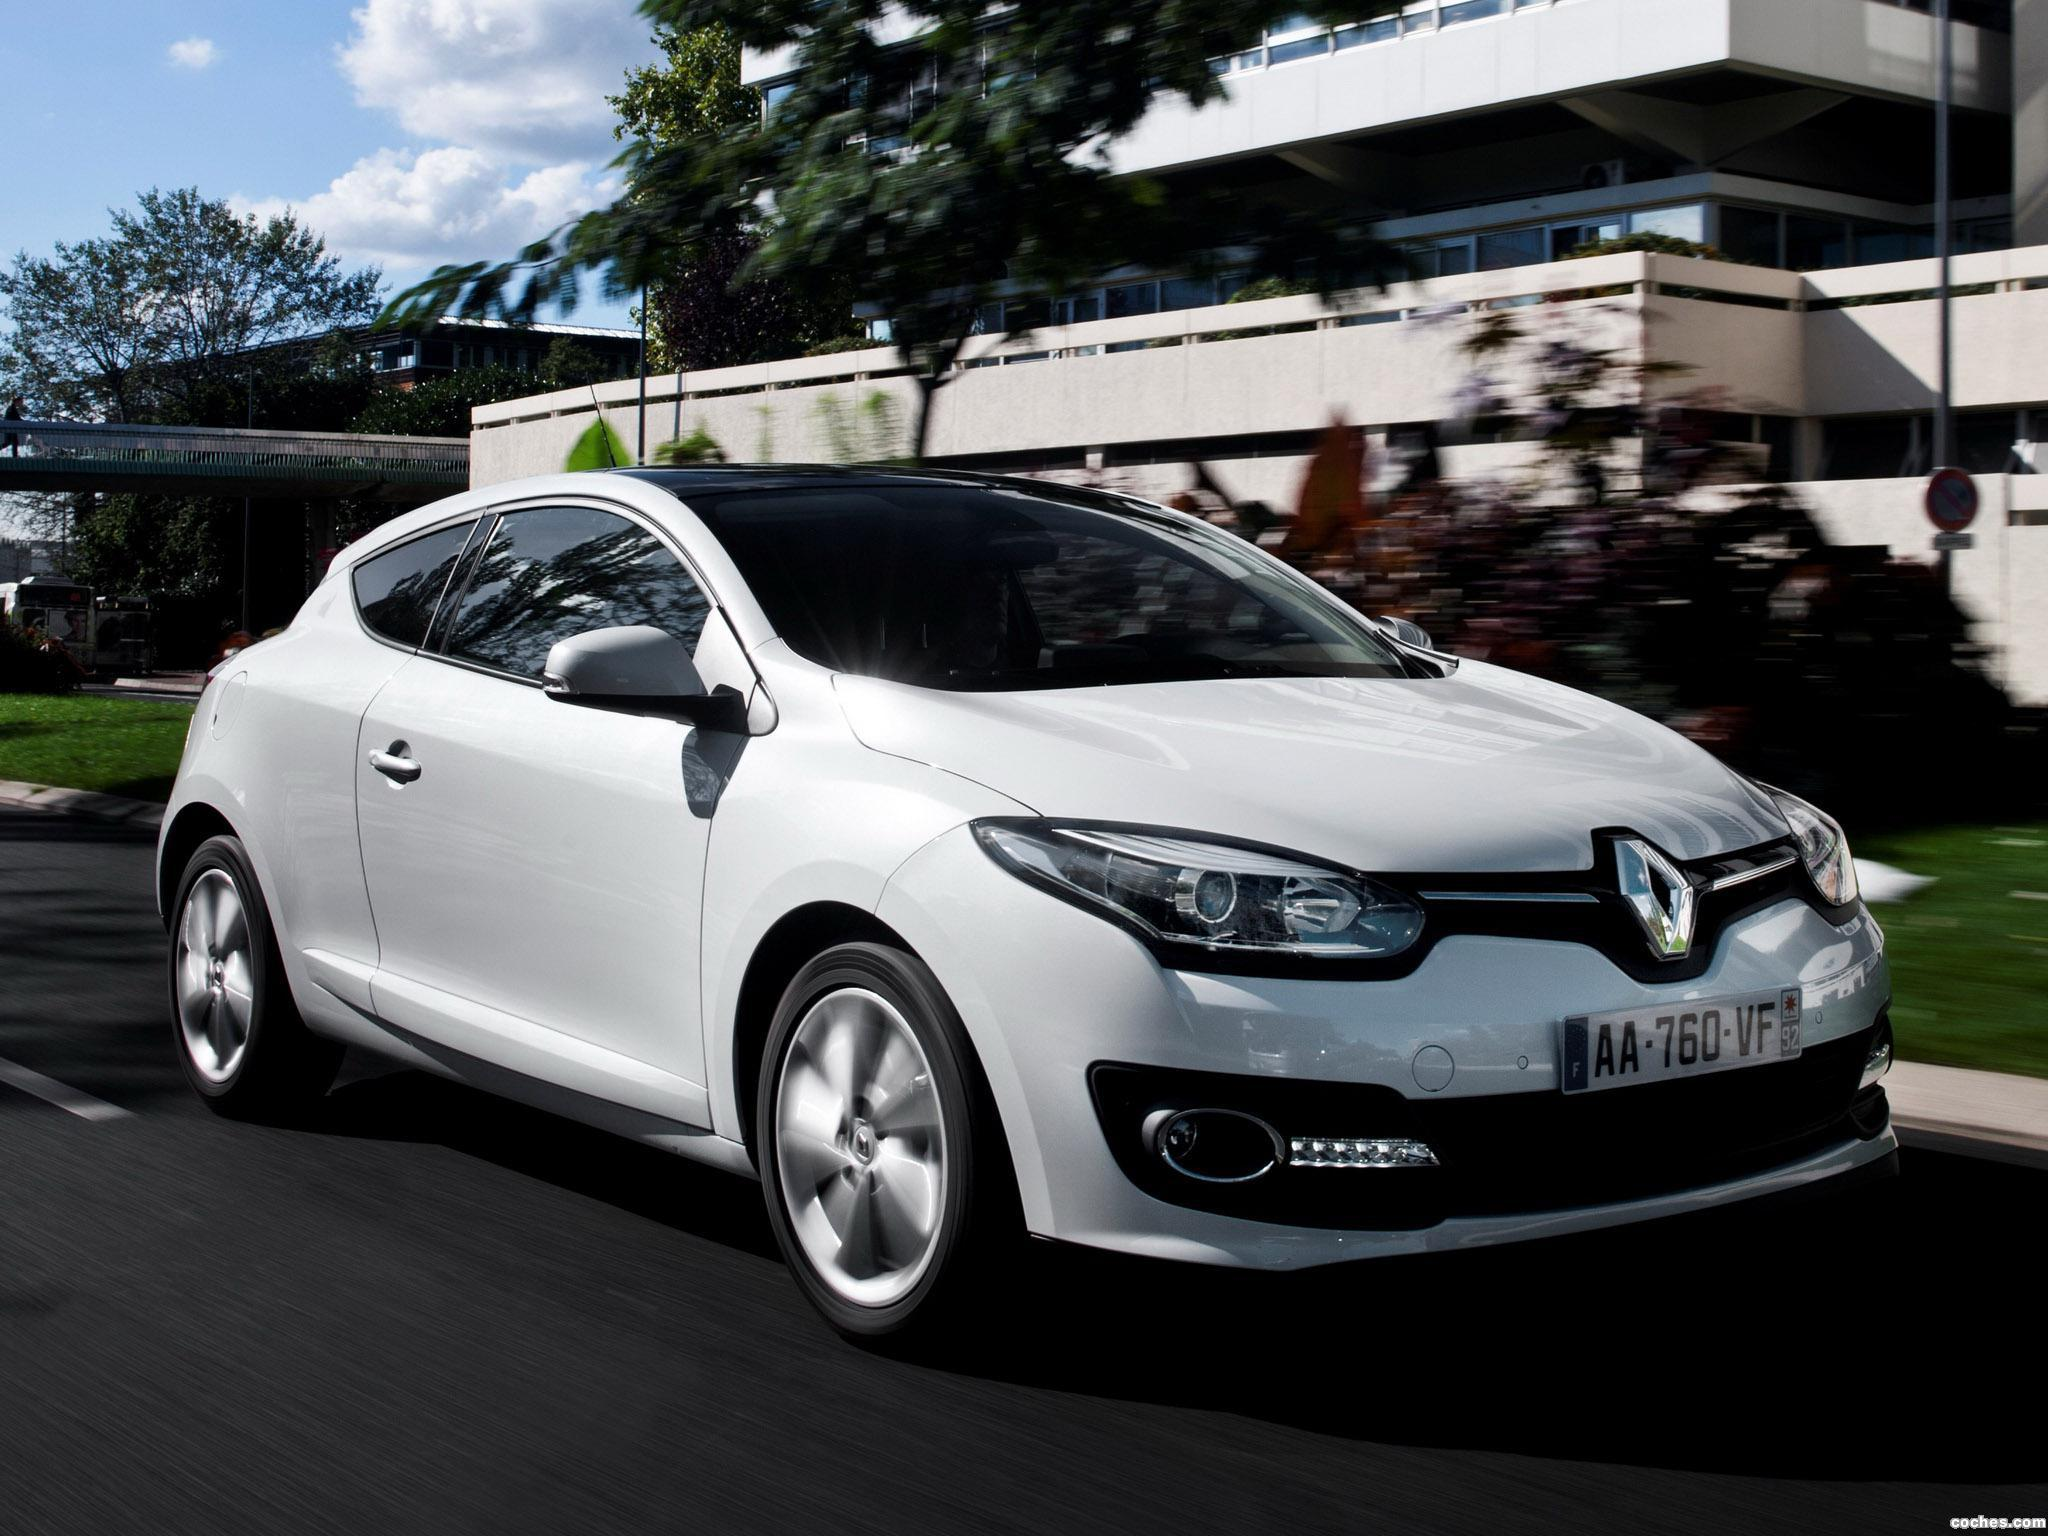 renault megane coupe 2014 r8 Renault Megane Coupe 2014